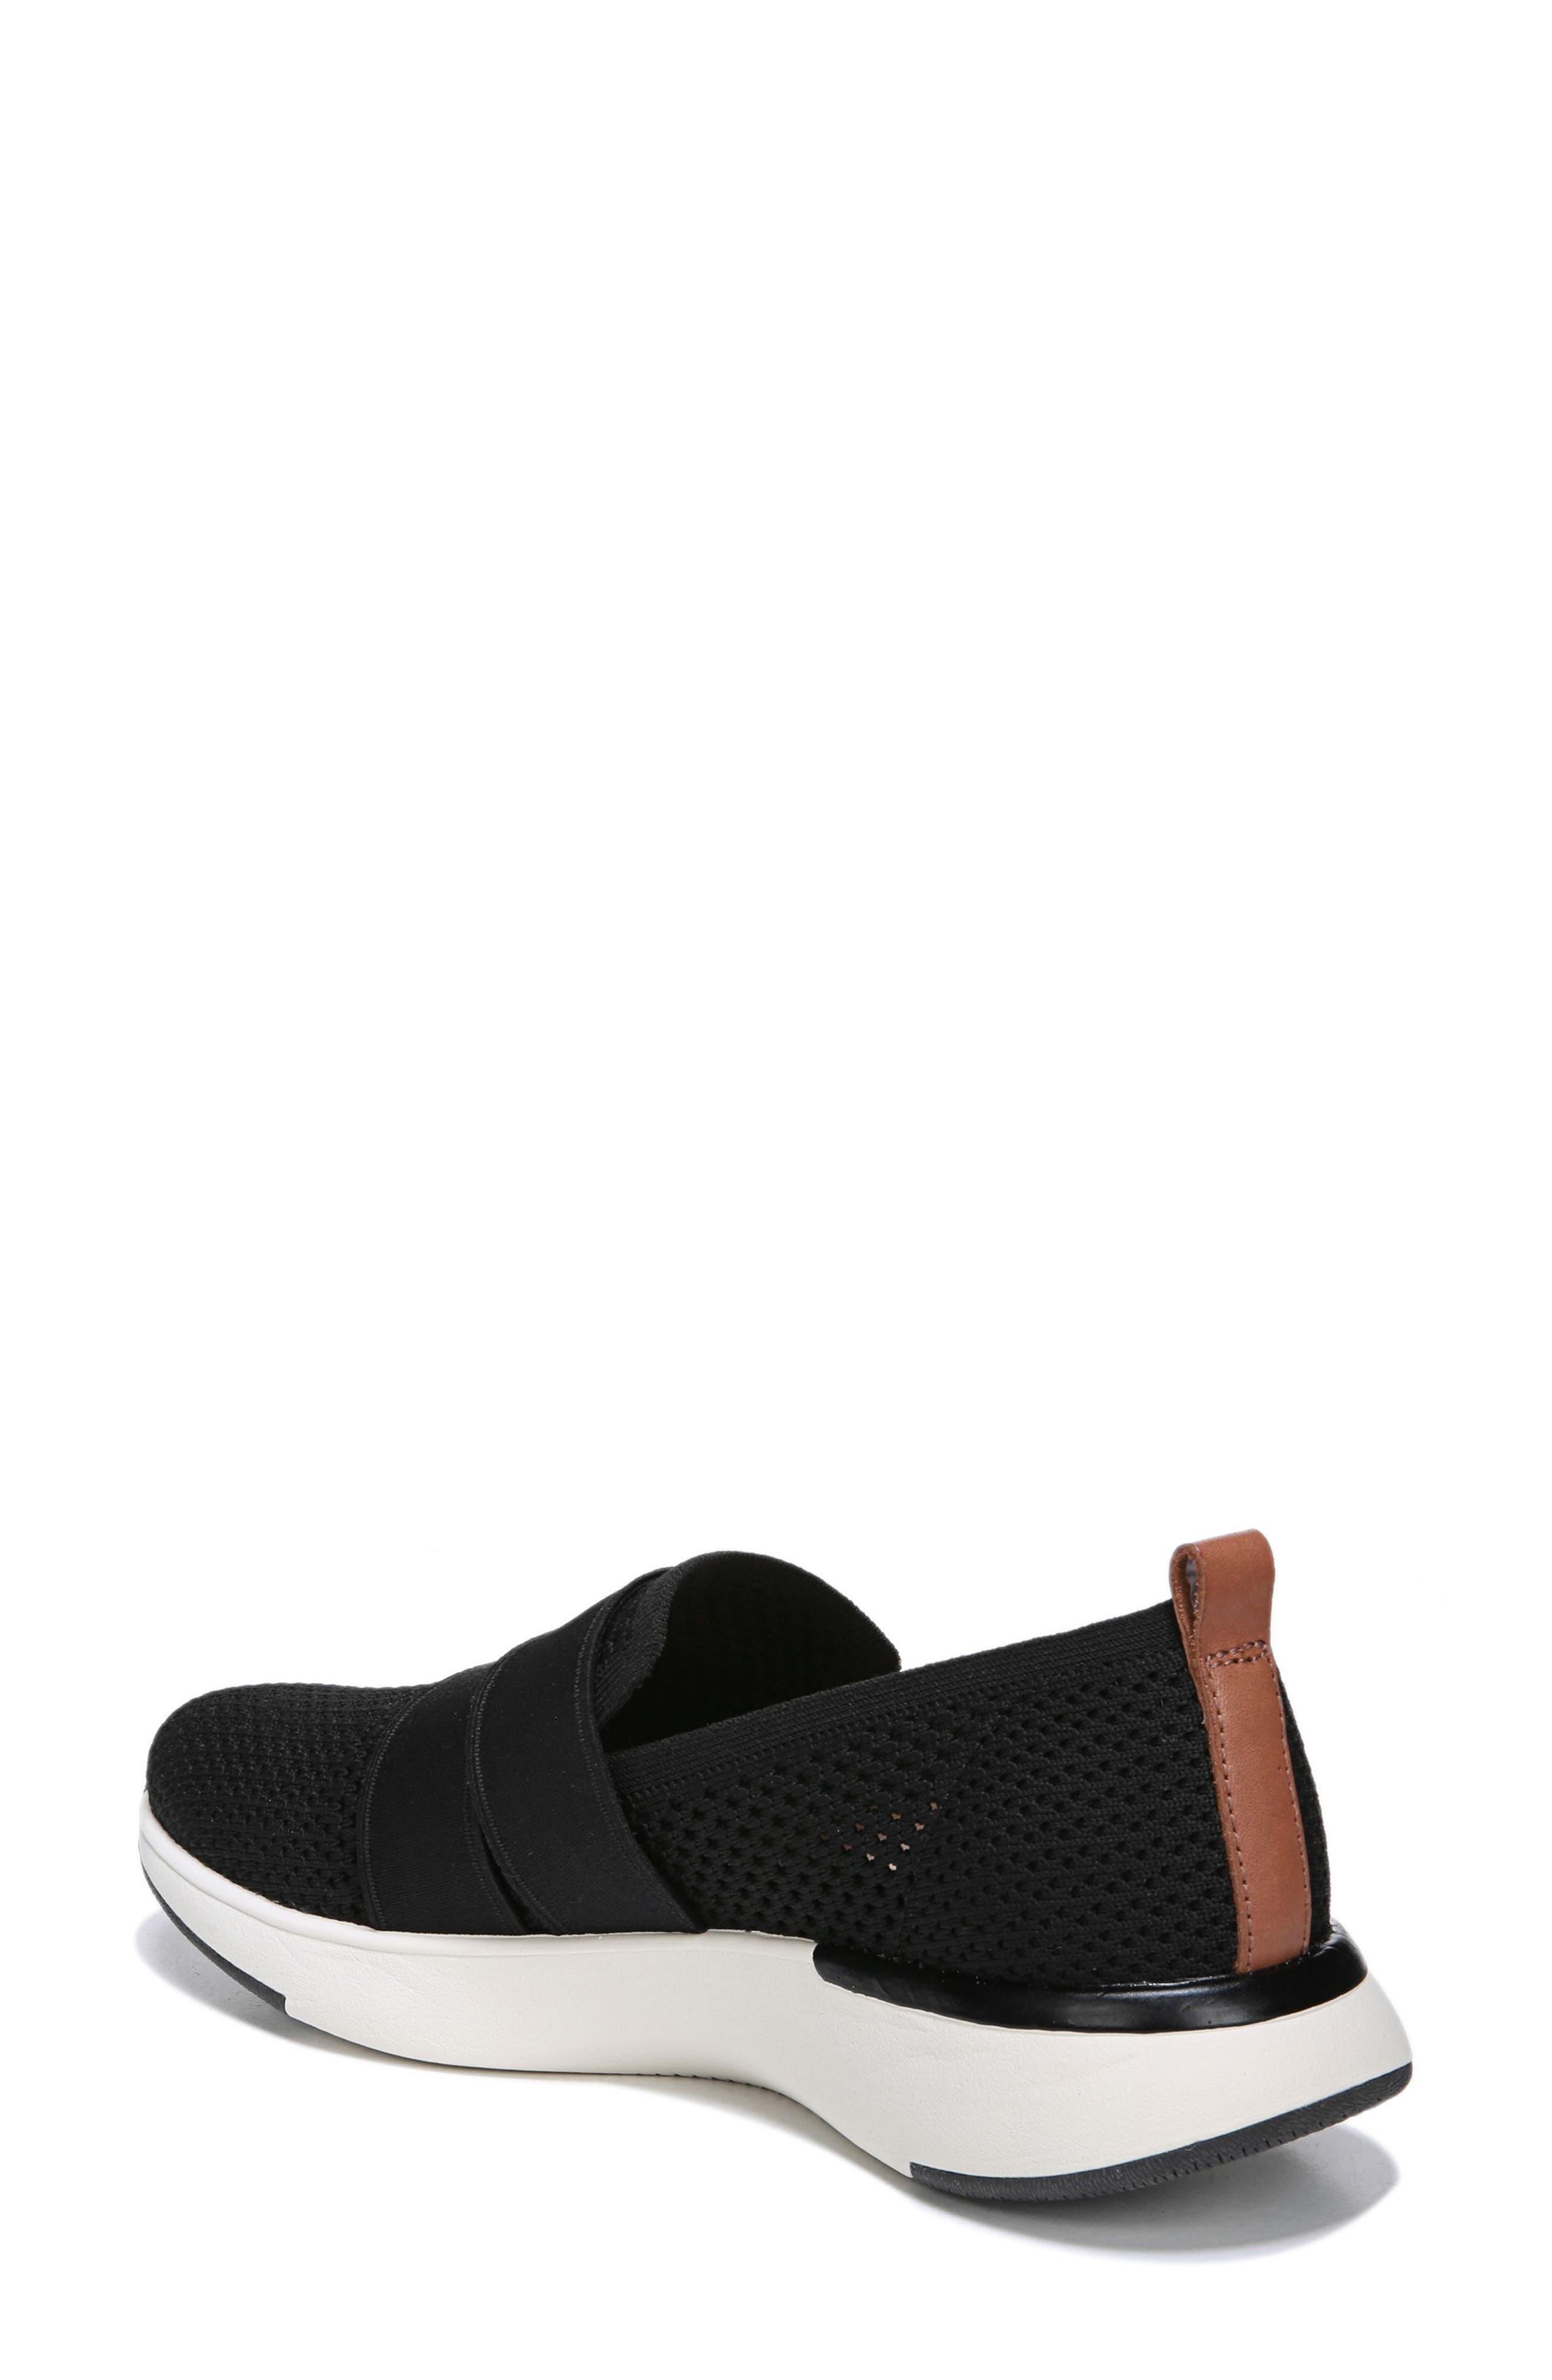 Slay All Day Sneaker,                             Alternate thumbnail 2, color,                             BLACK FABRIC